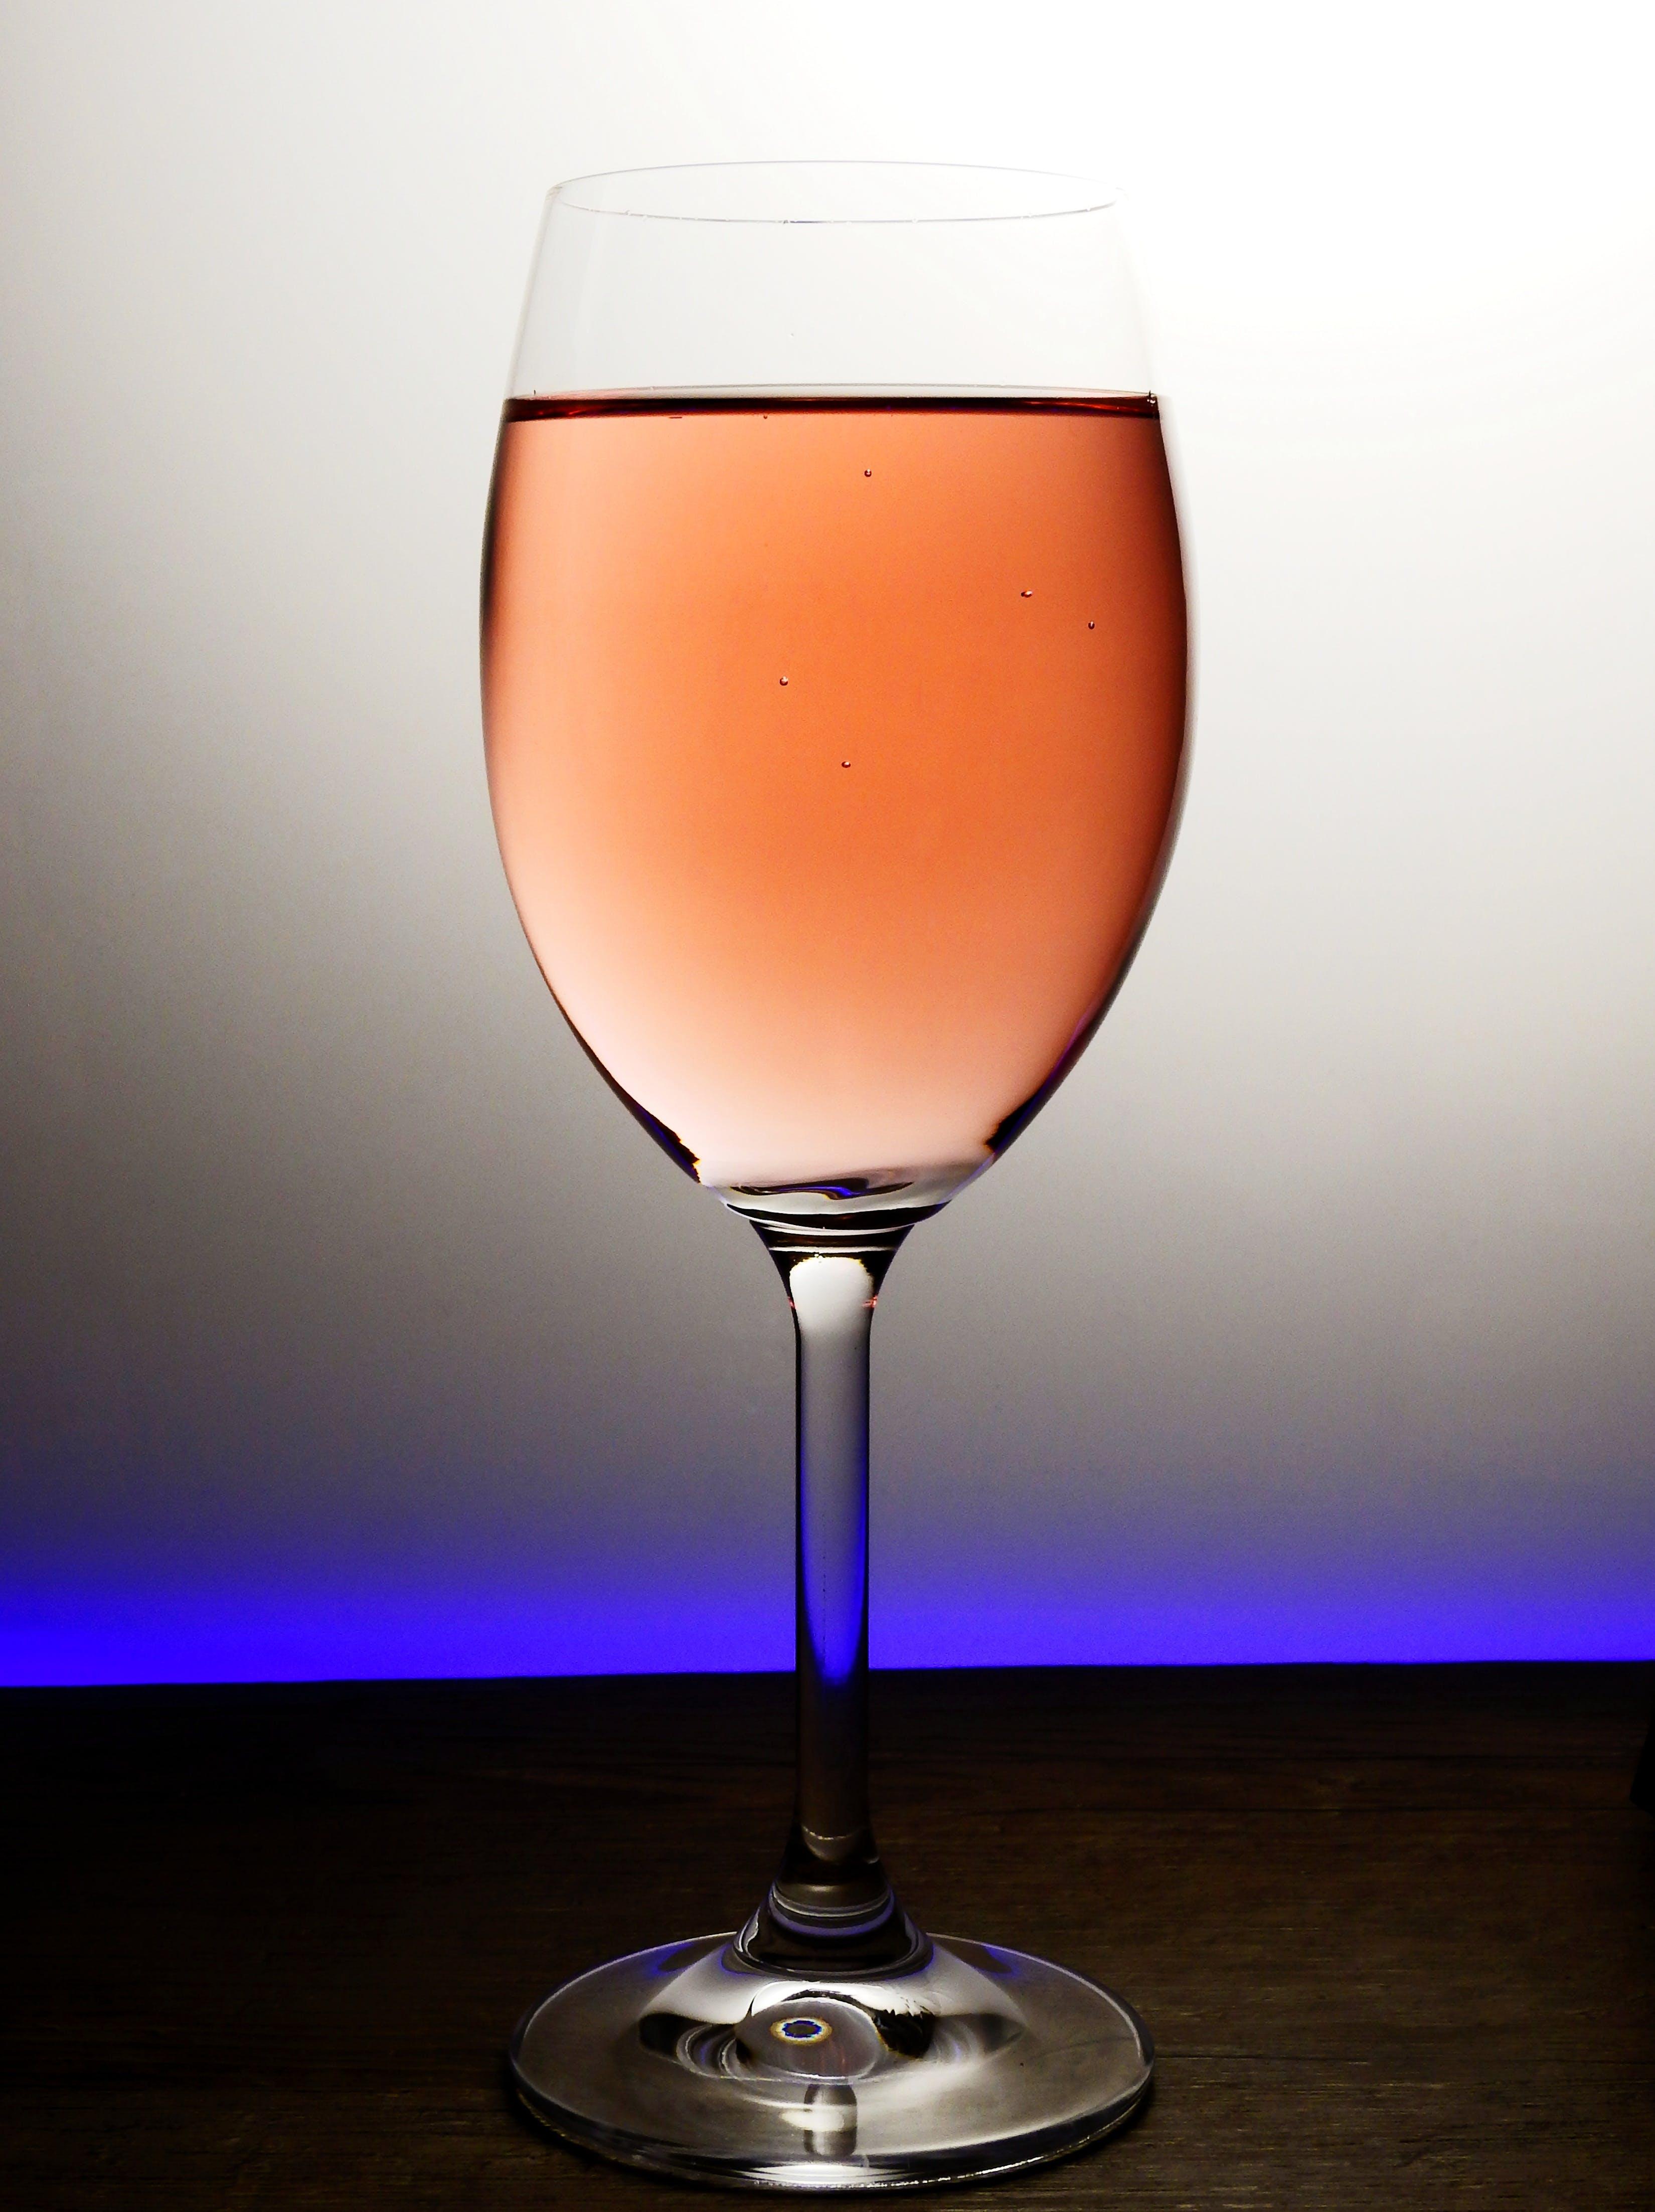 alkohol, alkoholisches getränk, chardonnay